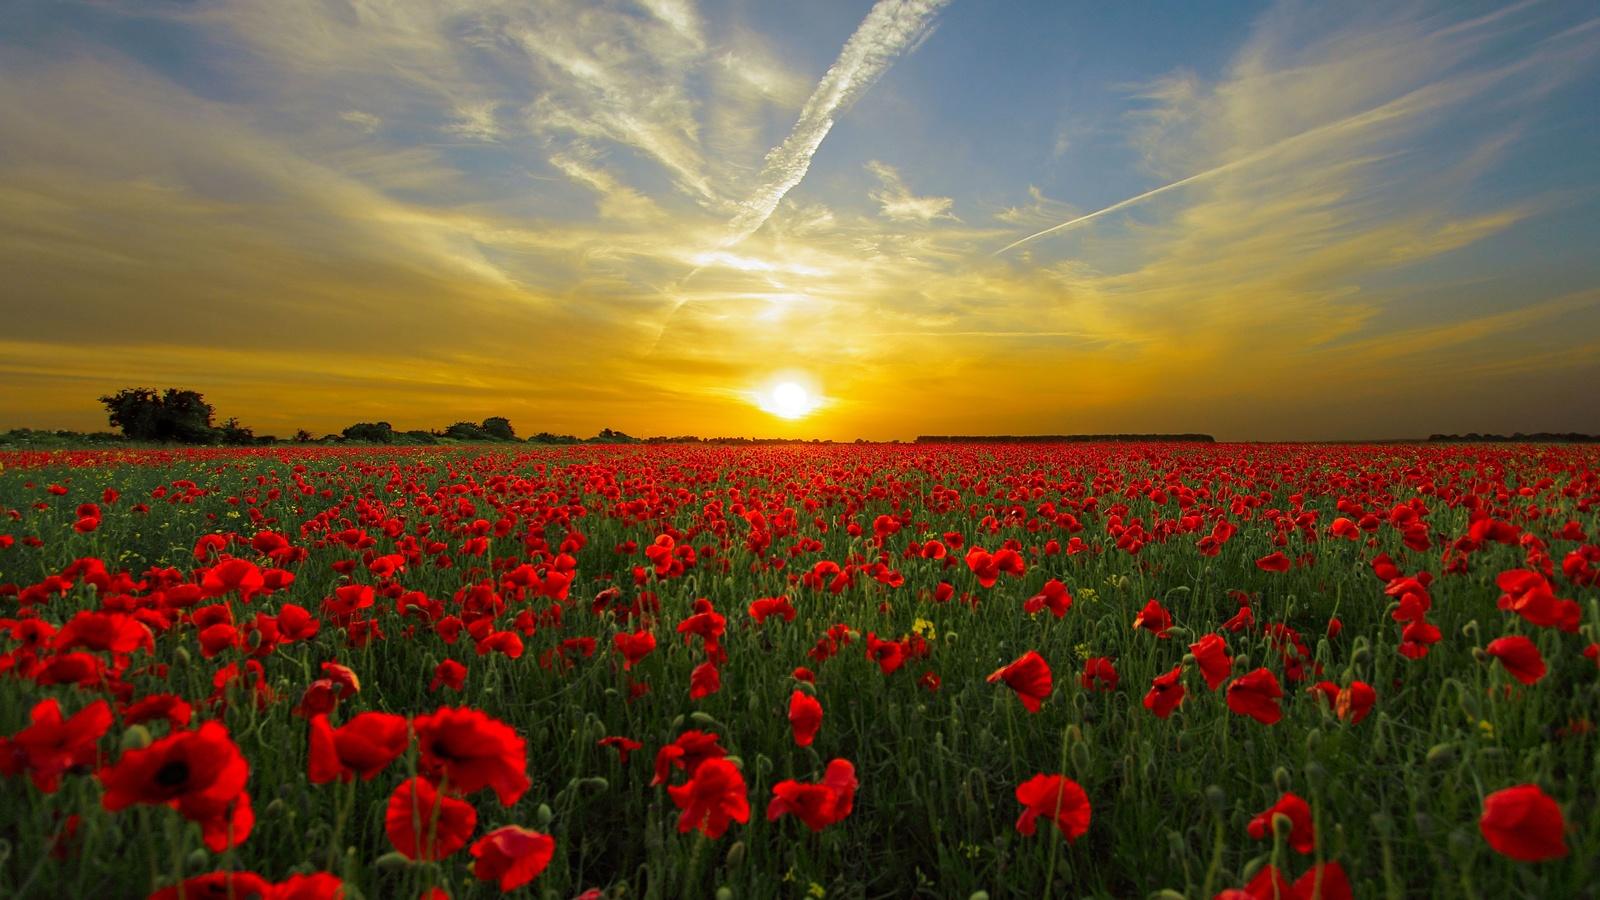 природа, пейзаж, лето, поле, цветы, маки, закат, солнце